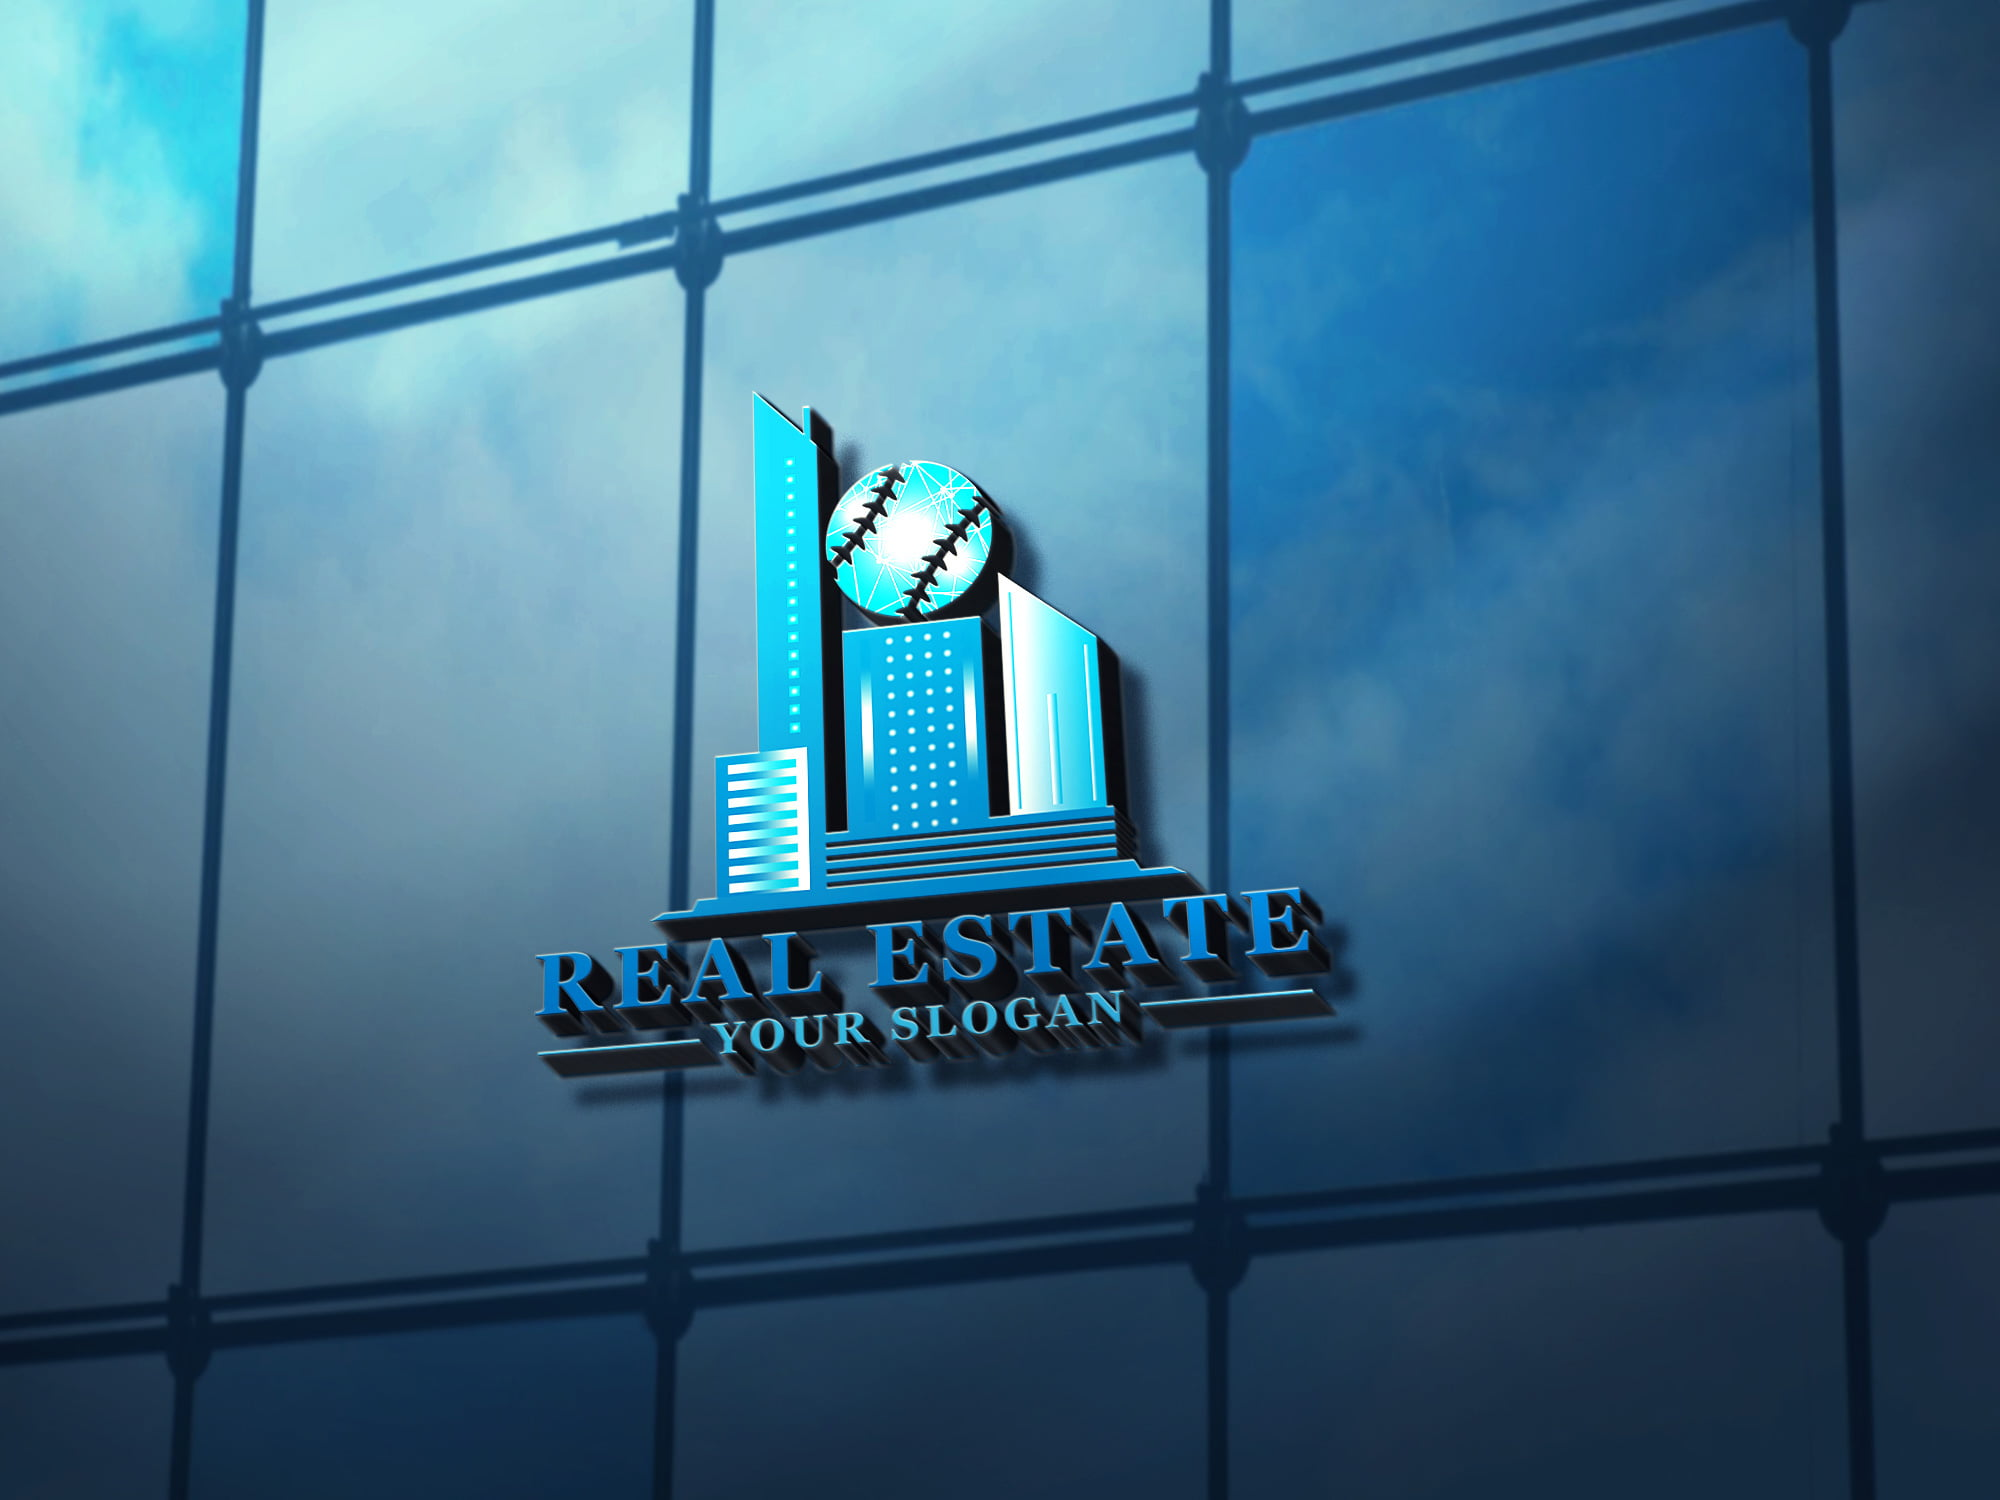 Premium-Real-Estate-Logo-Template-3D-glass-mockup-premium